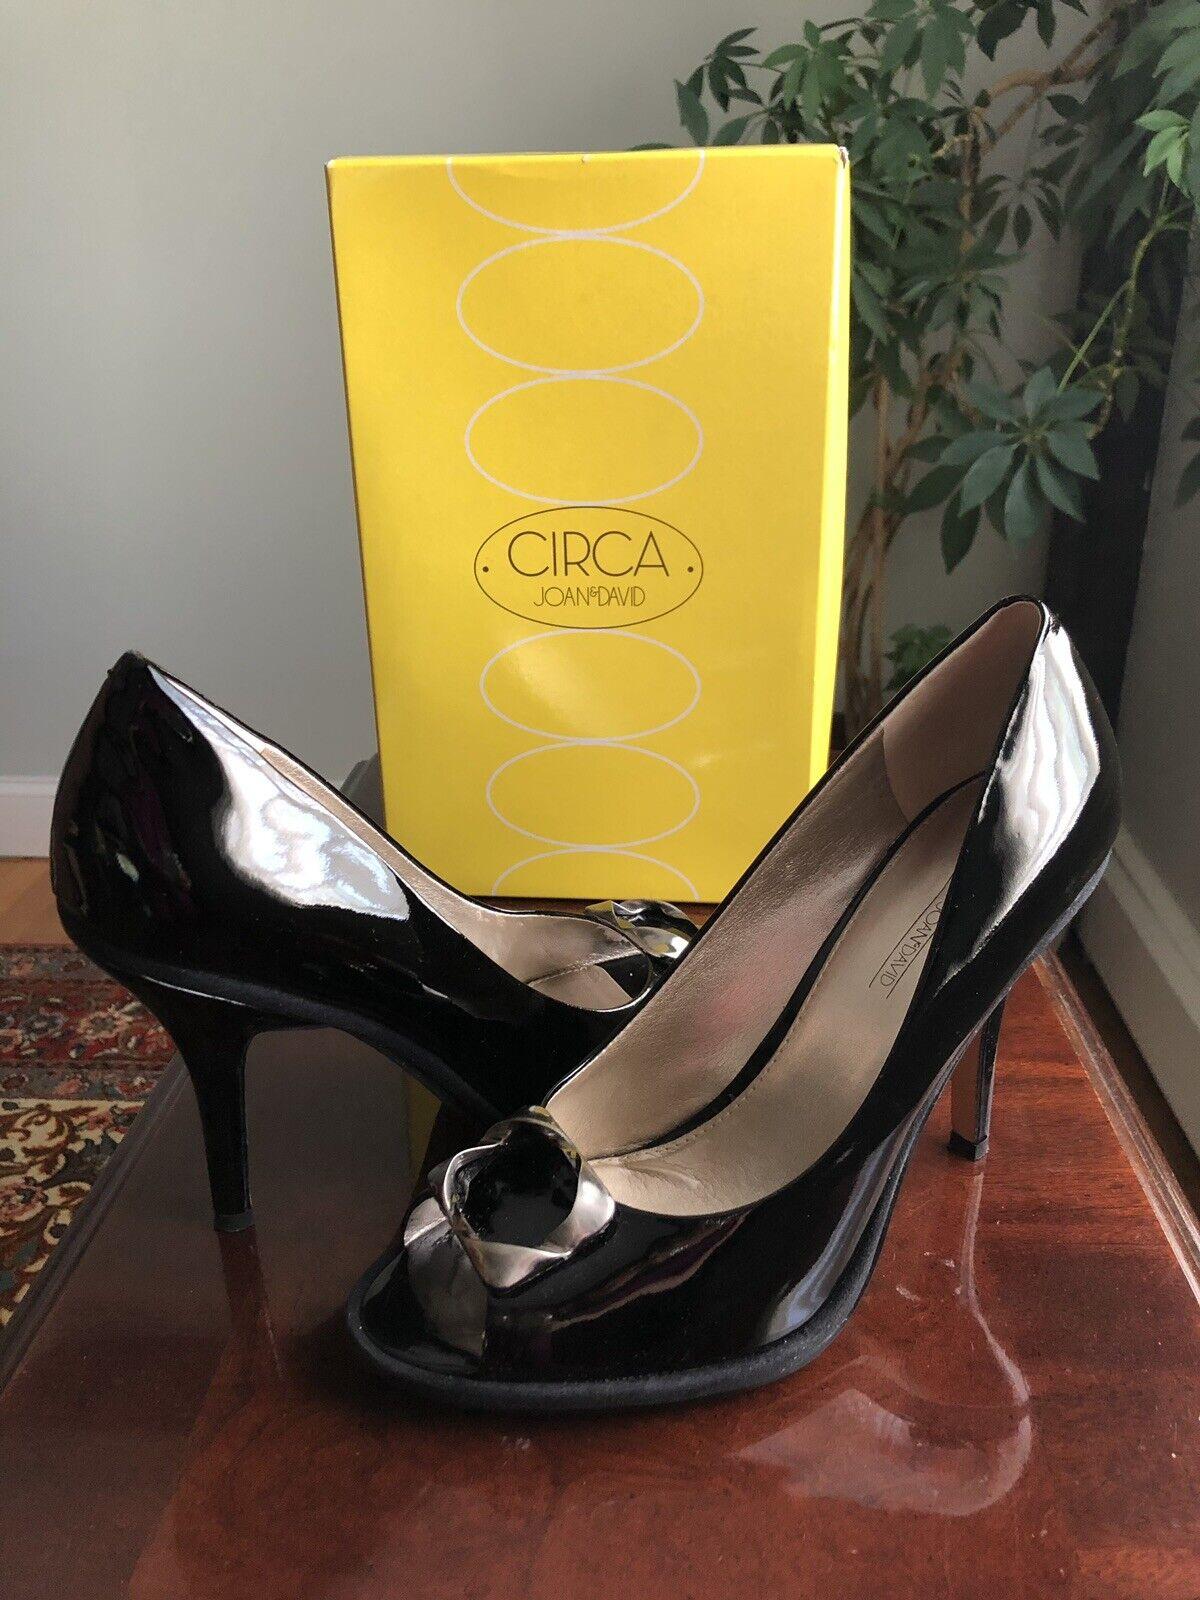 CIRCA JOAN & DAVID KAIROS Peep Toe Patent Leather Pumps 10 M